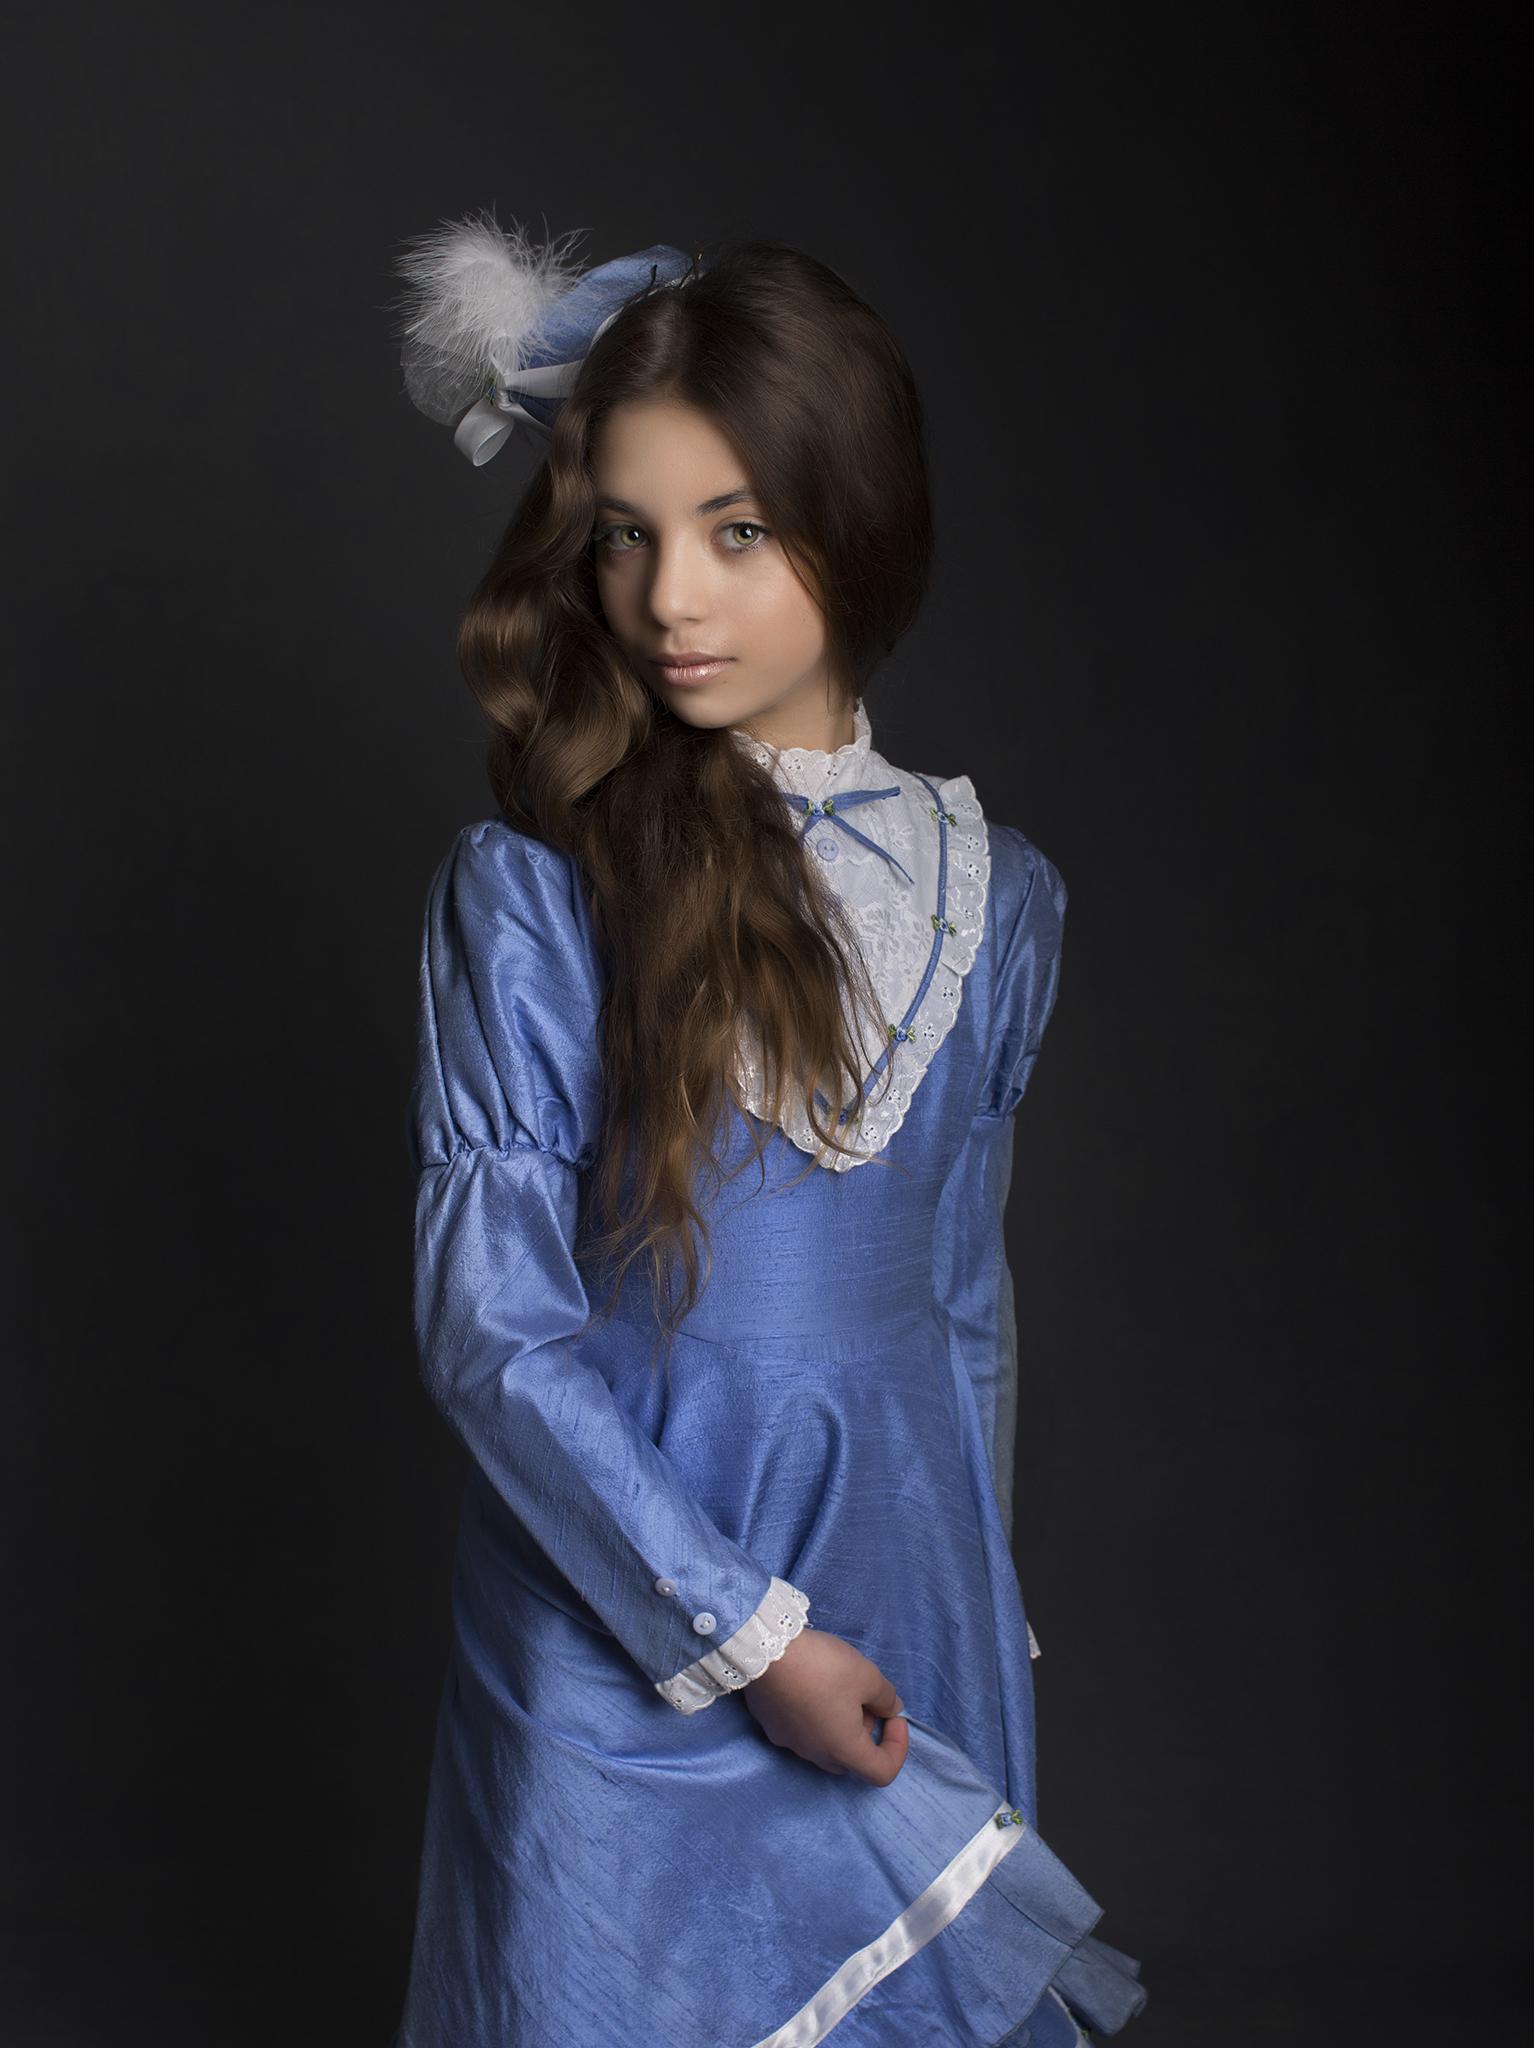 elizabethgphotography_fineart_kingslangley_hertfordshire_child_model_dancer_elysia_1.jpg